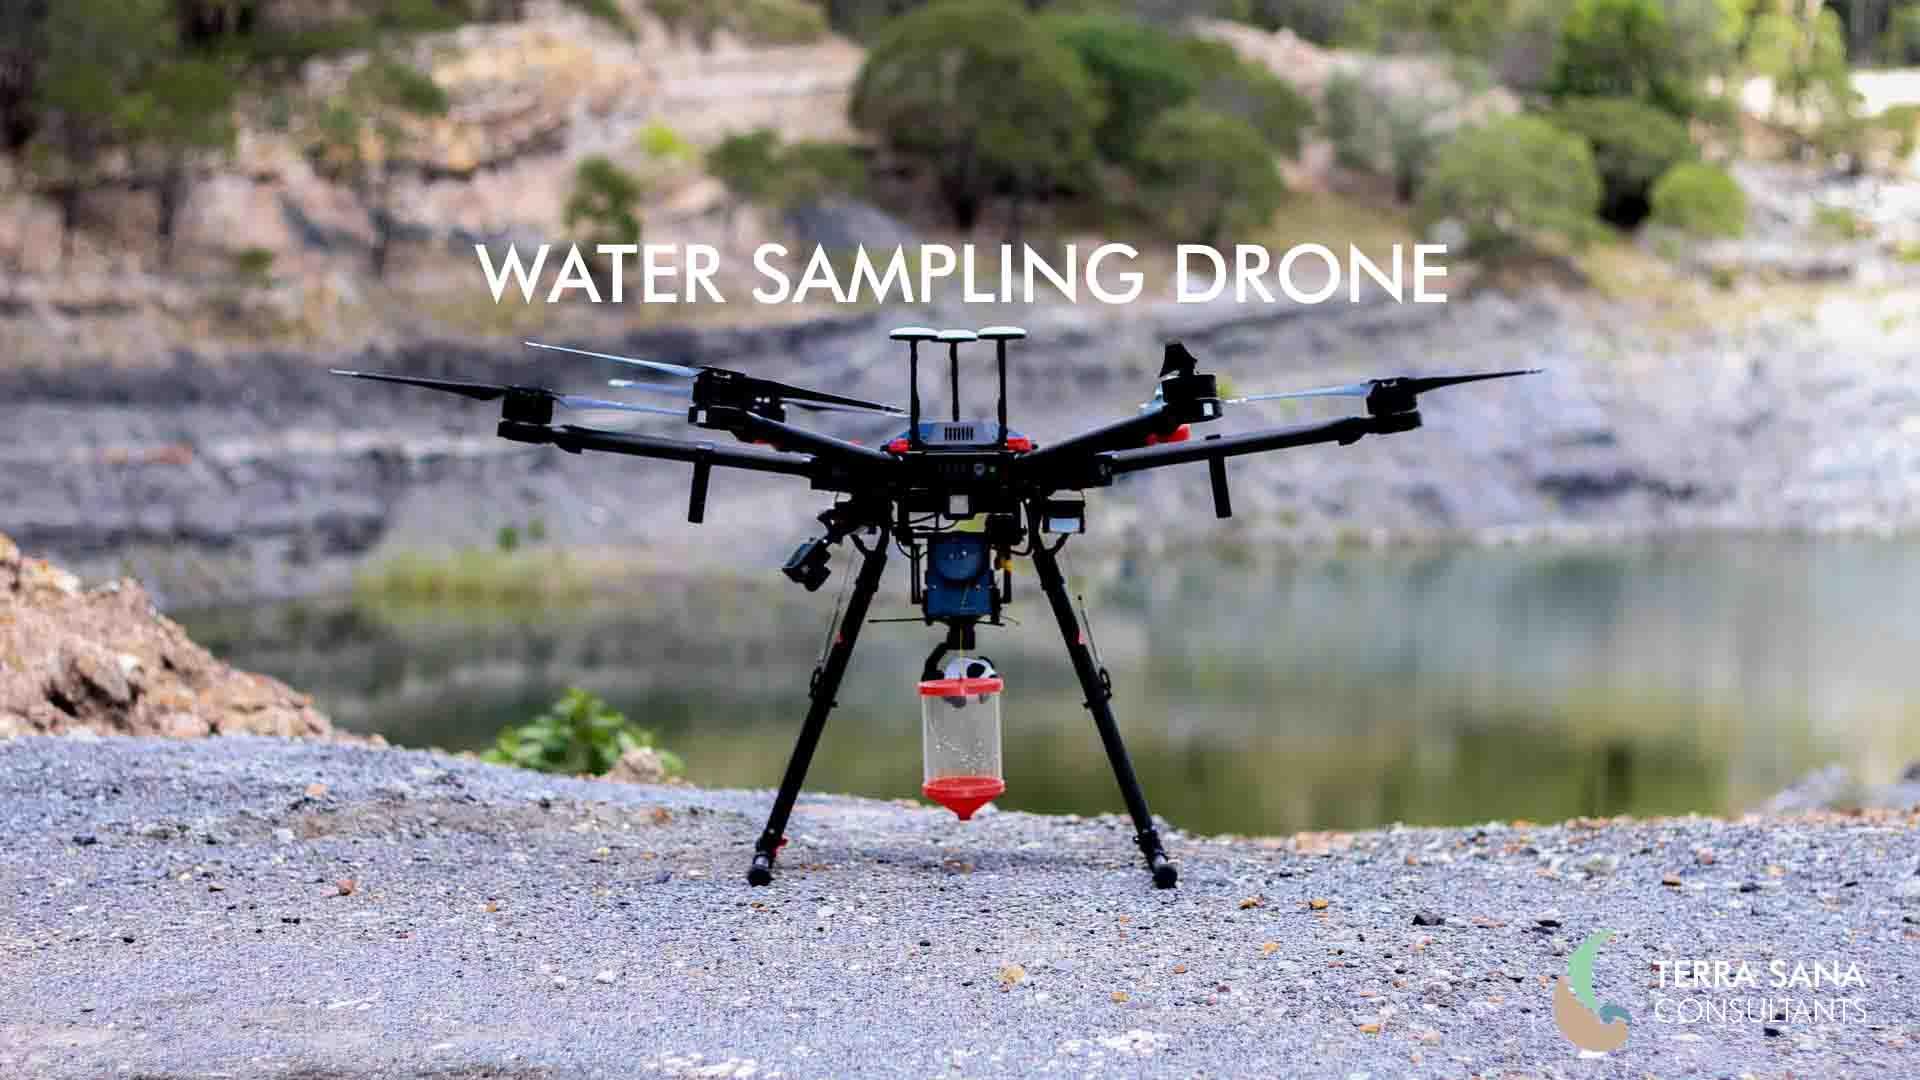 Water sampling drone